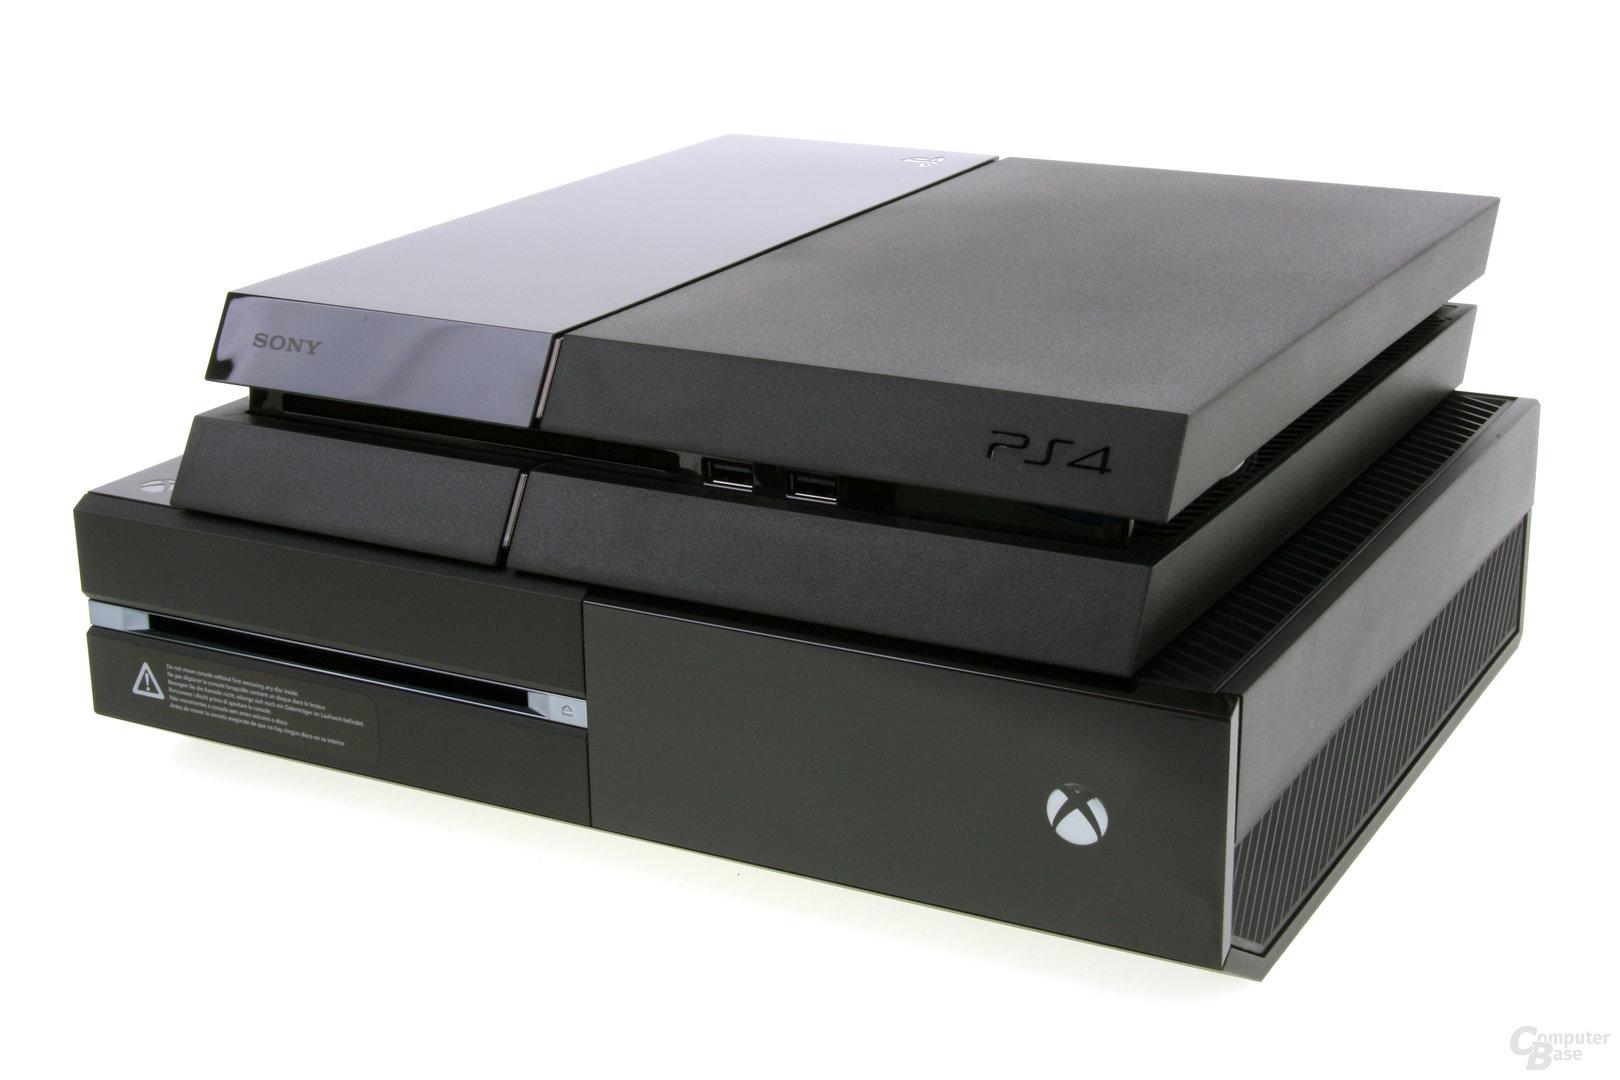 Sony PlayStation 4 im Vergleich zur Xbox One